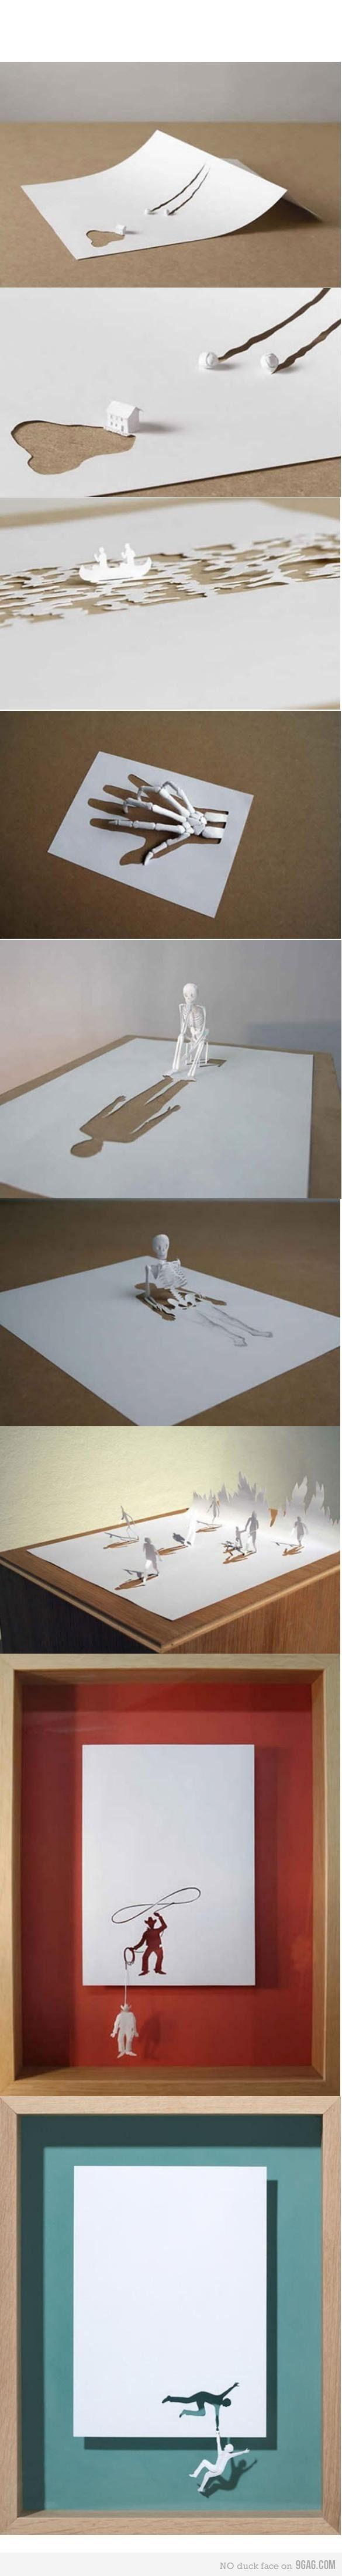 clever paper art.